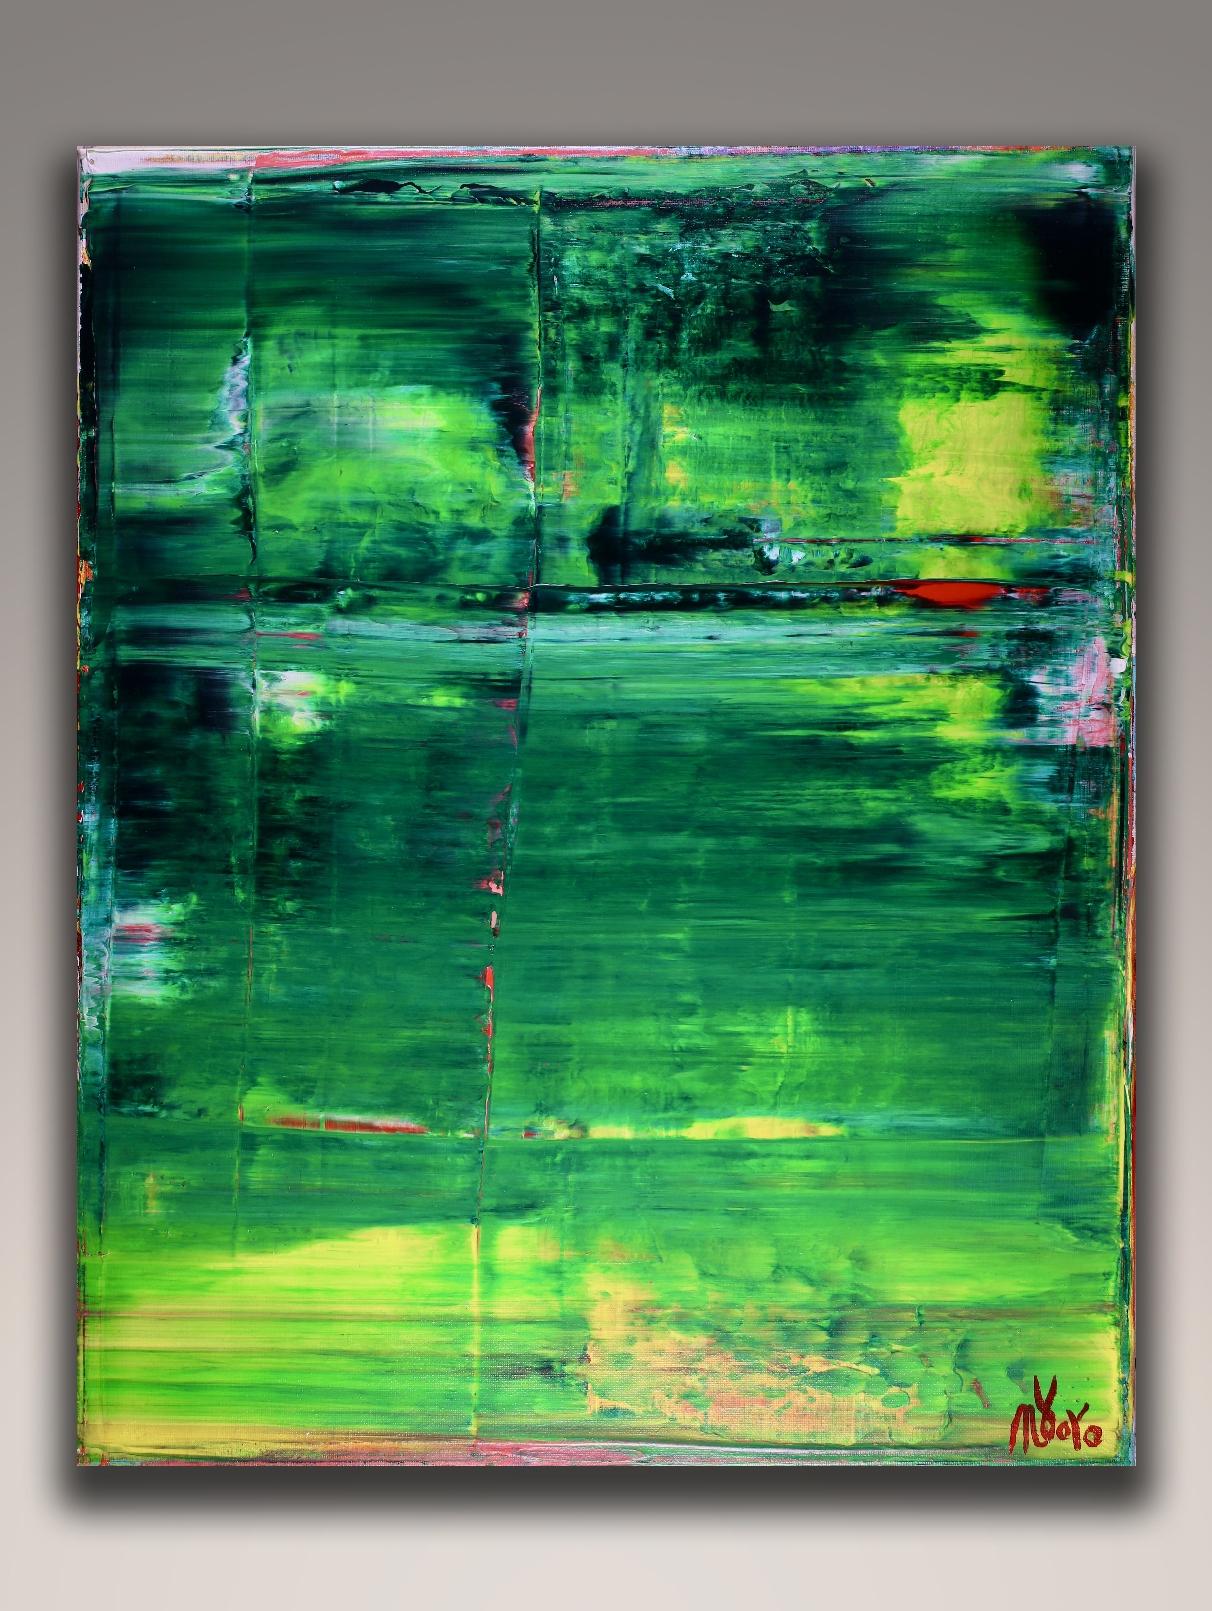 SOLD - Emerald Garden (2018) Acrylic painting by Nestor Toro